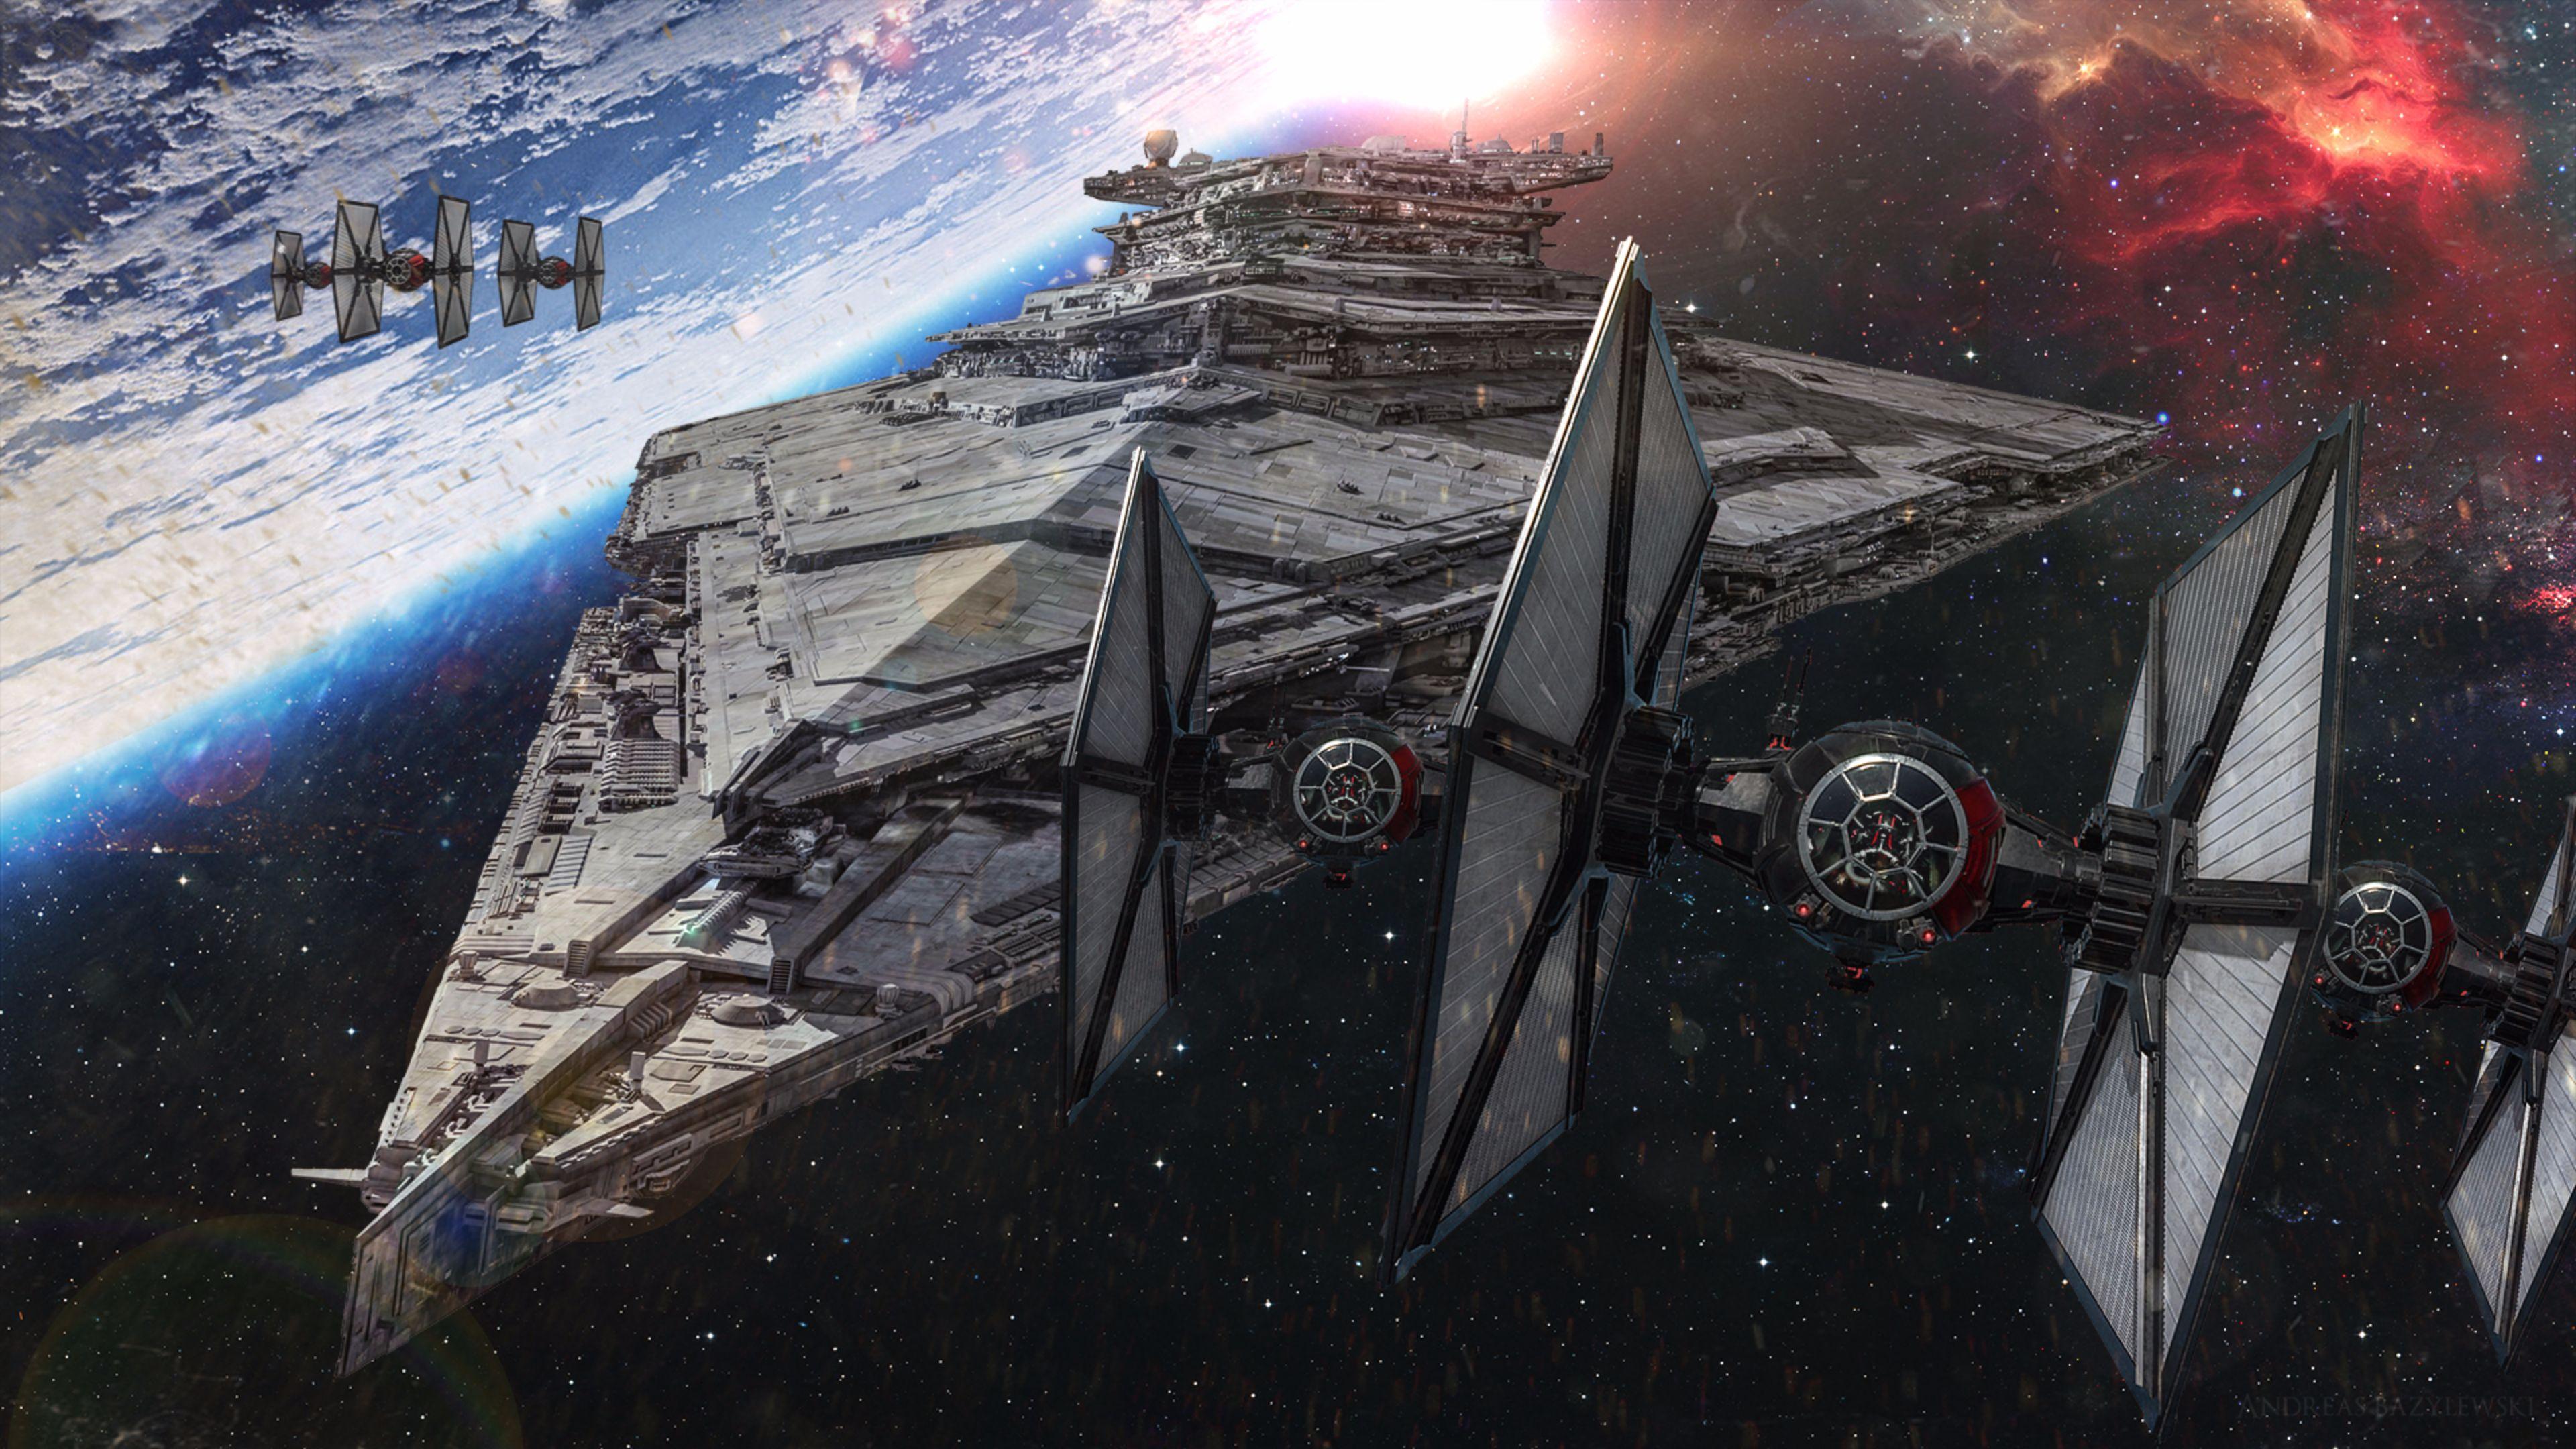 Inspirational Star Wars The Force Awakens 4k Wallpaper